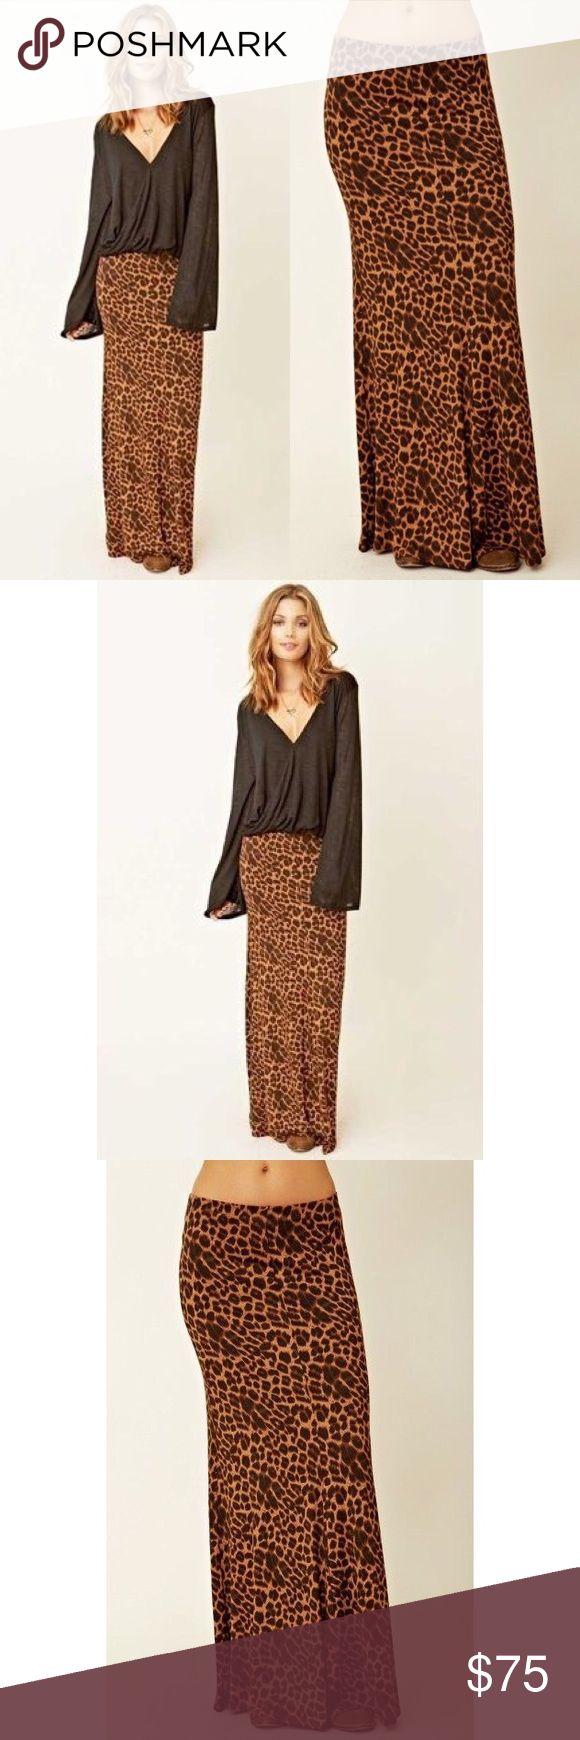 Blu Moon Leopard Maxi Skirt Leopard print stretch maxi skirt. Size Medium. 95% Viscose/5% Spandex. Brand is Blu Moon. New with tags. 🚫 Trades. Nasty Gal Skirts Maxi